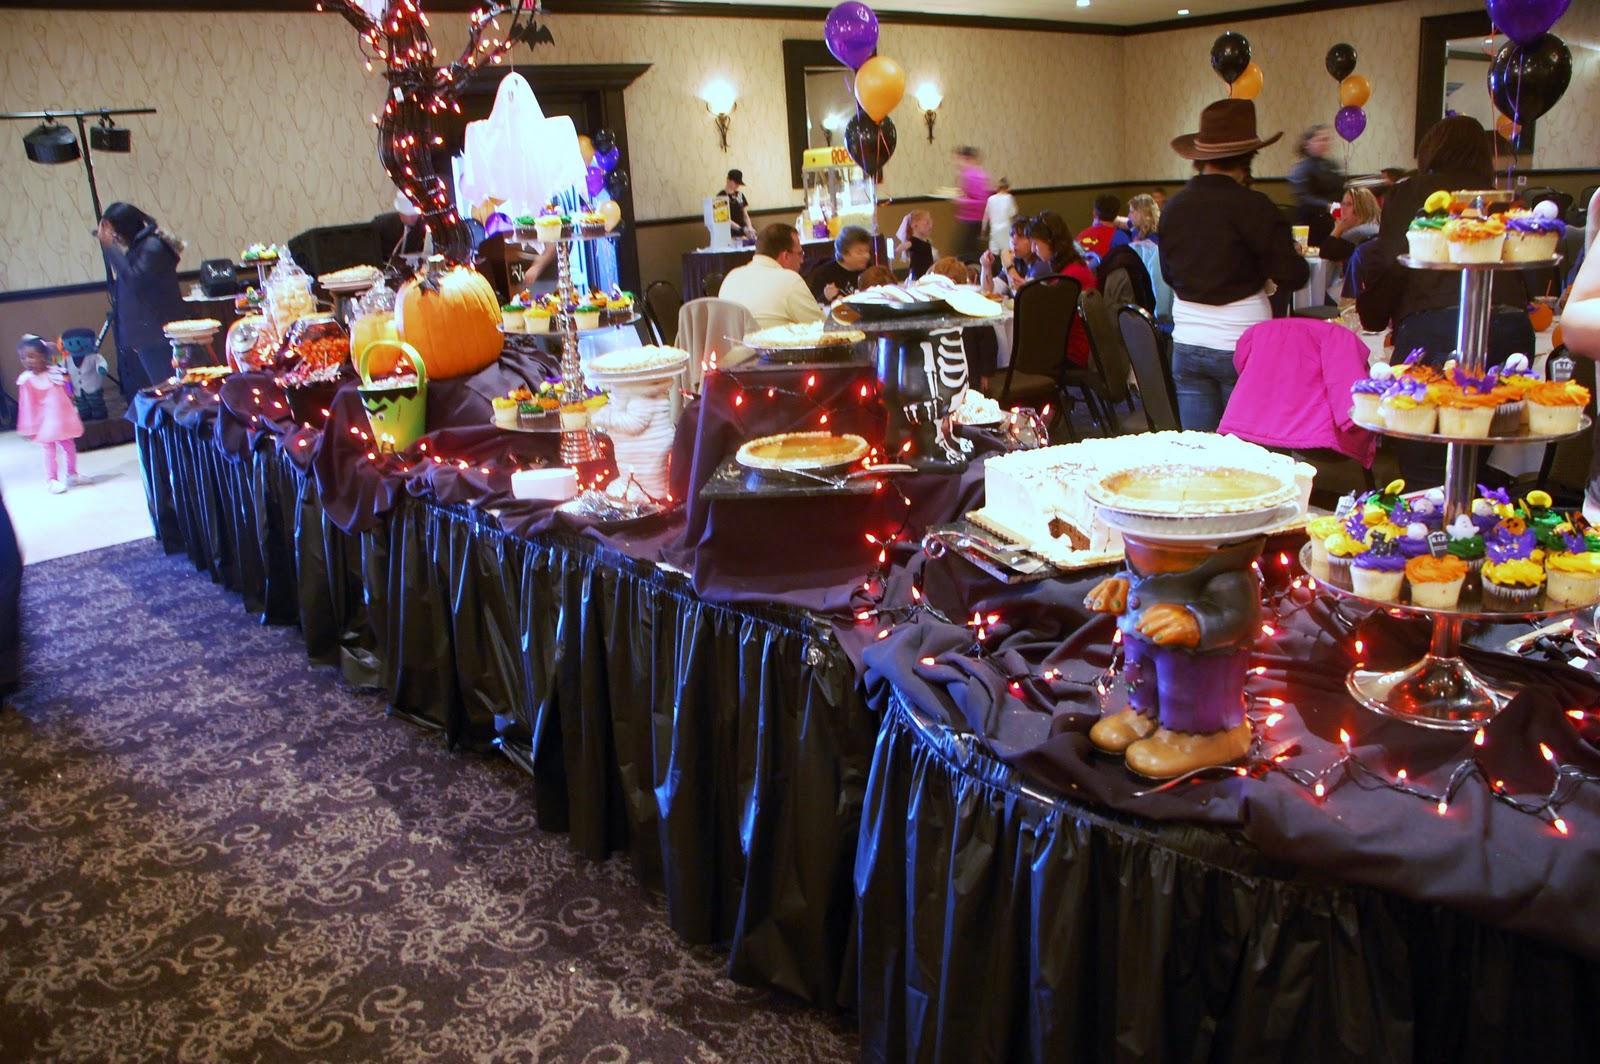 Thar She Sews!: Matador costume hits the Halloween party circuit